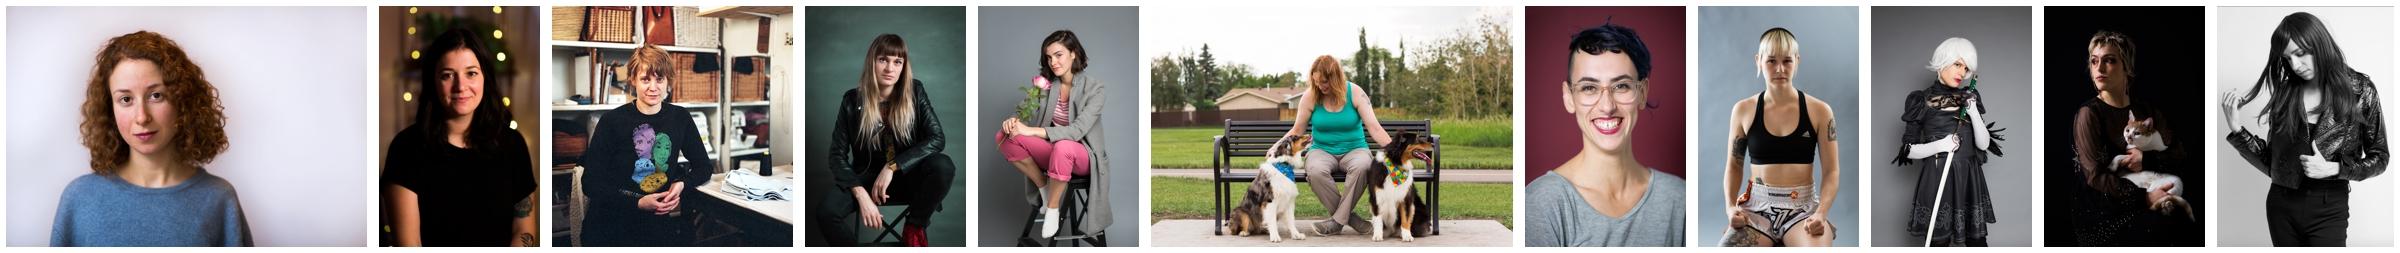 International Women's Day 2019 (Montreal Portrait Photographer Life by Selena Photography)_0019.jpg